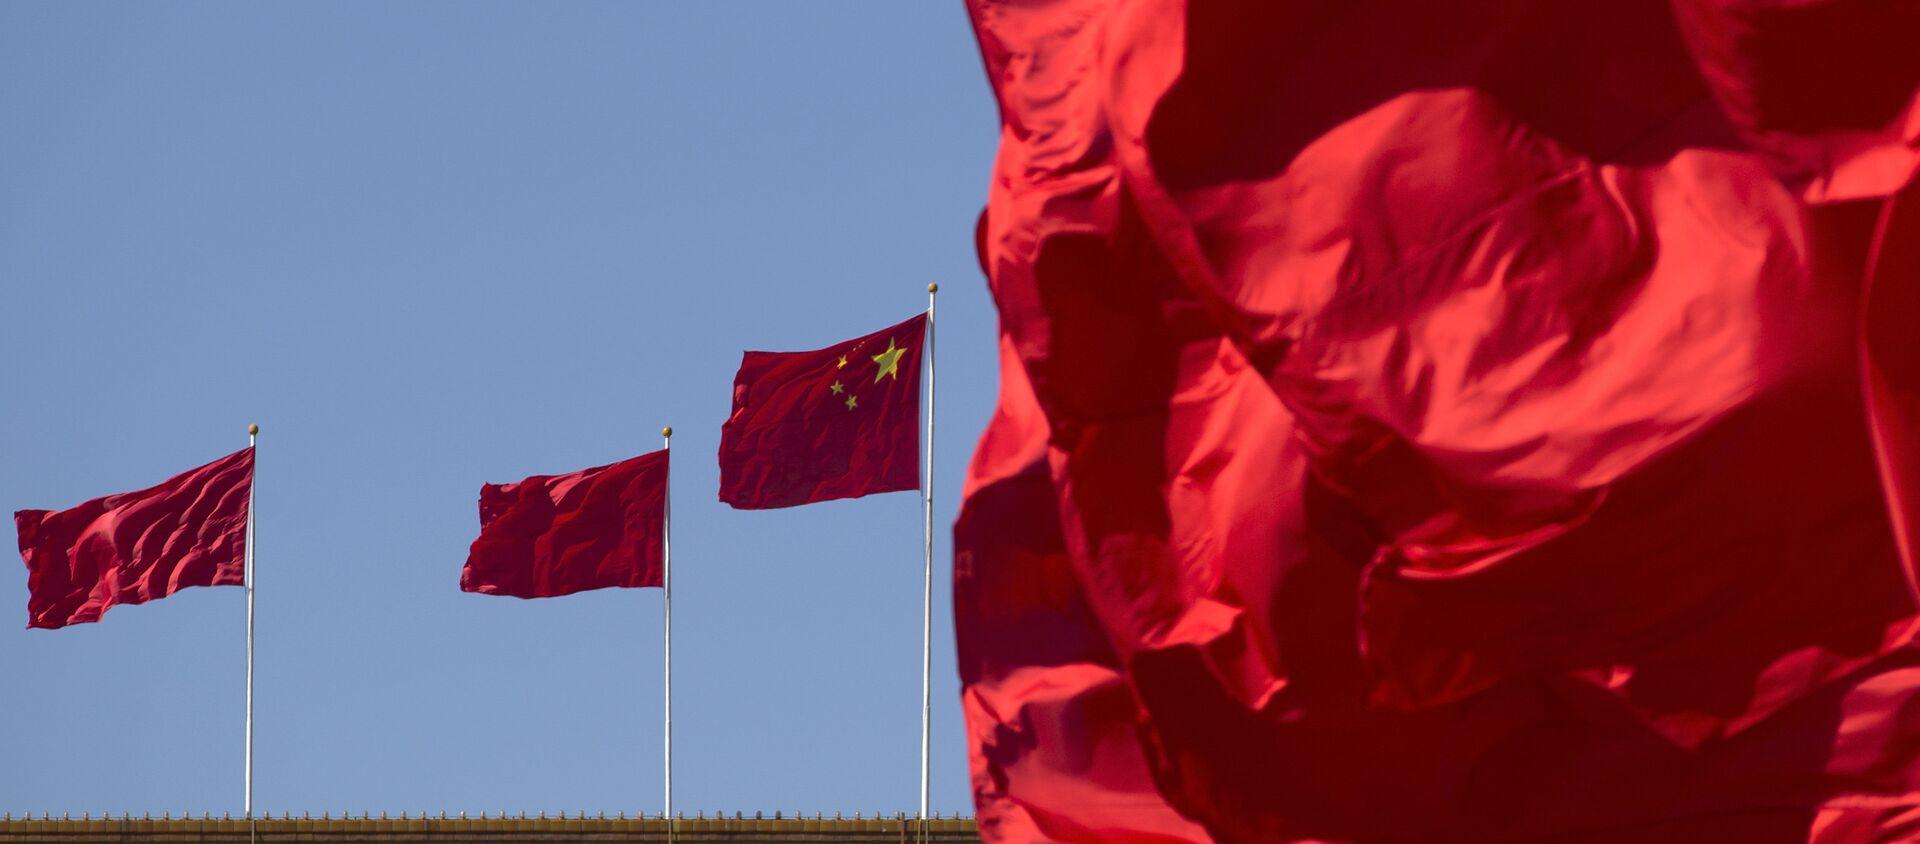 Флаги Китая на здании Дома народных собраний в Пекине, фото из архива - Sputnik Азербайджан, 1920, 28.03.2021